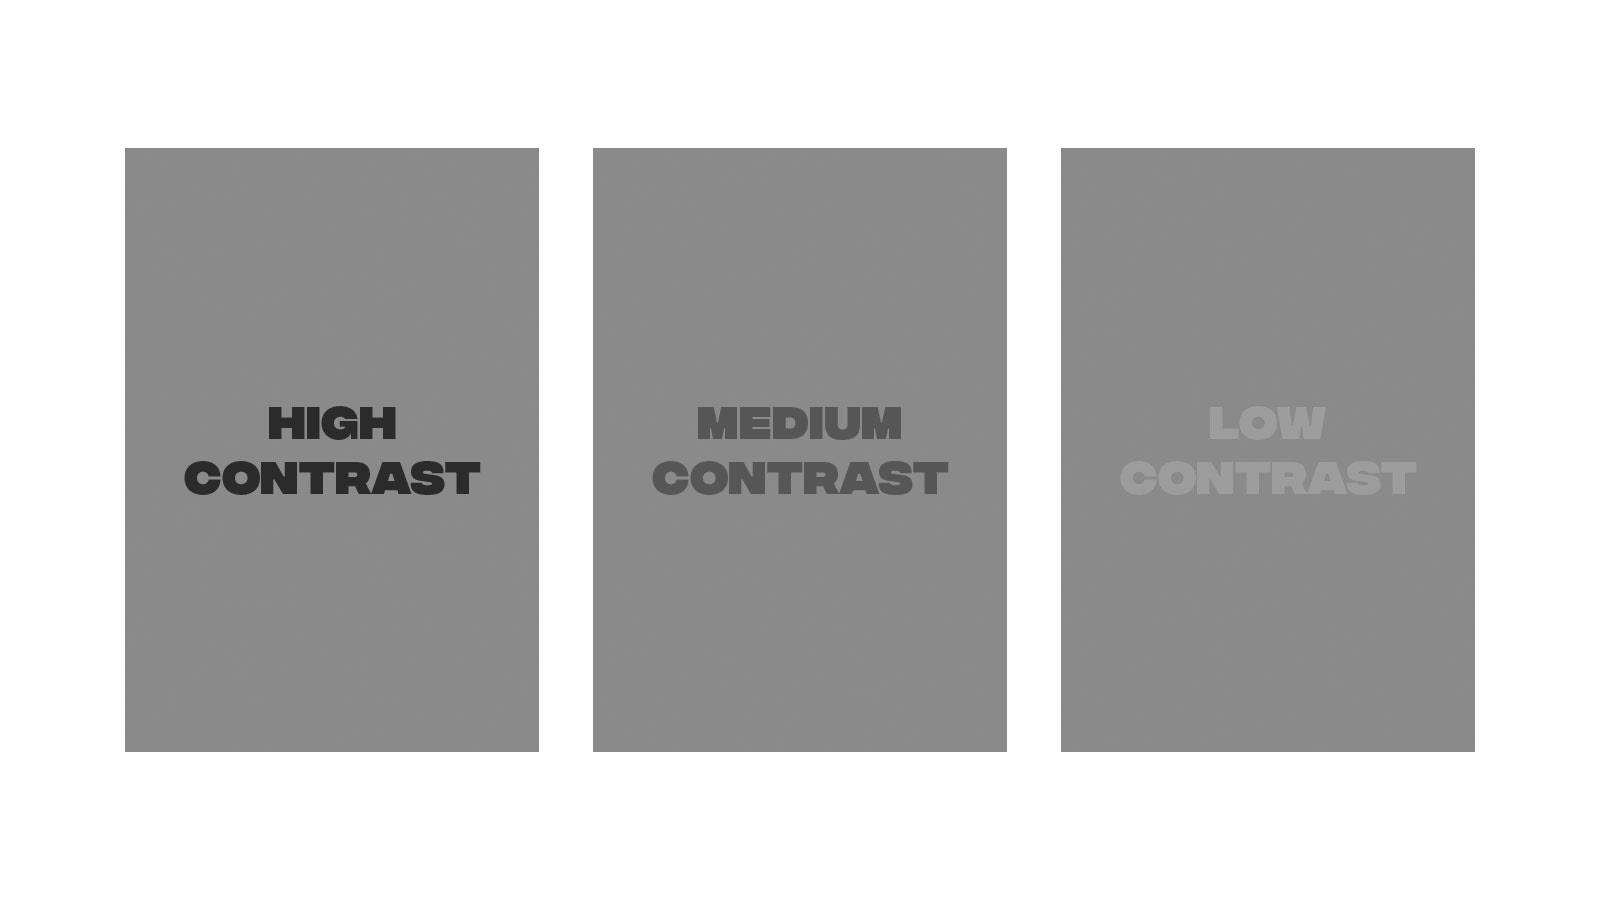 graphic comparing high vs medium vs low contrast